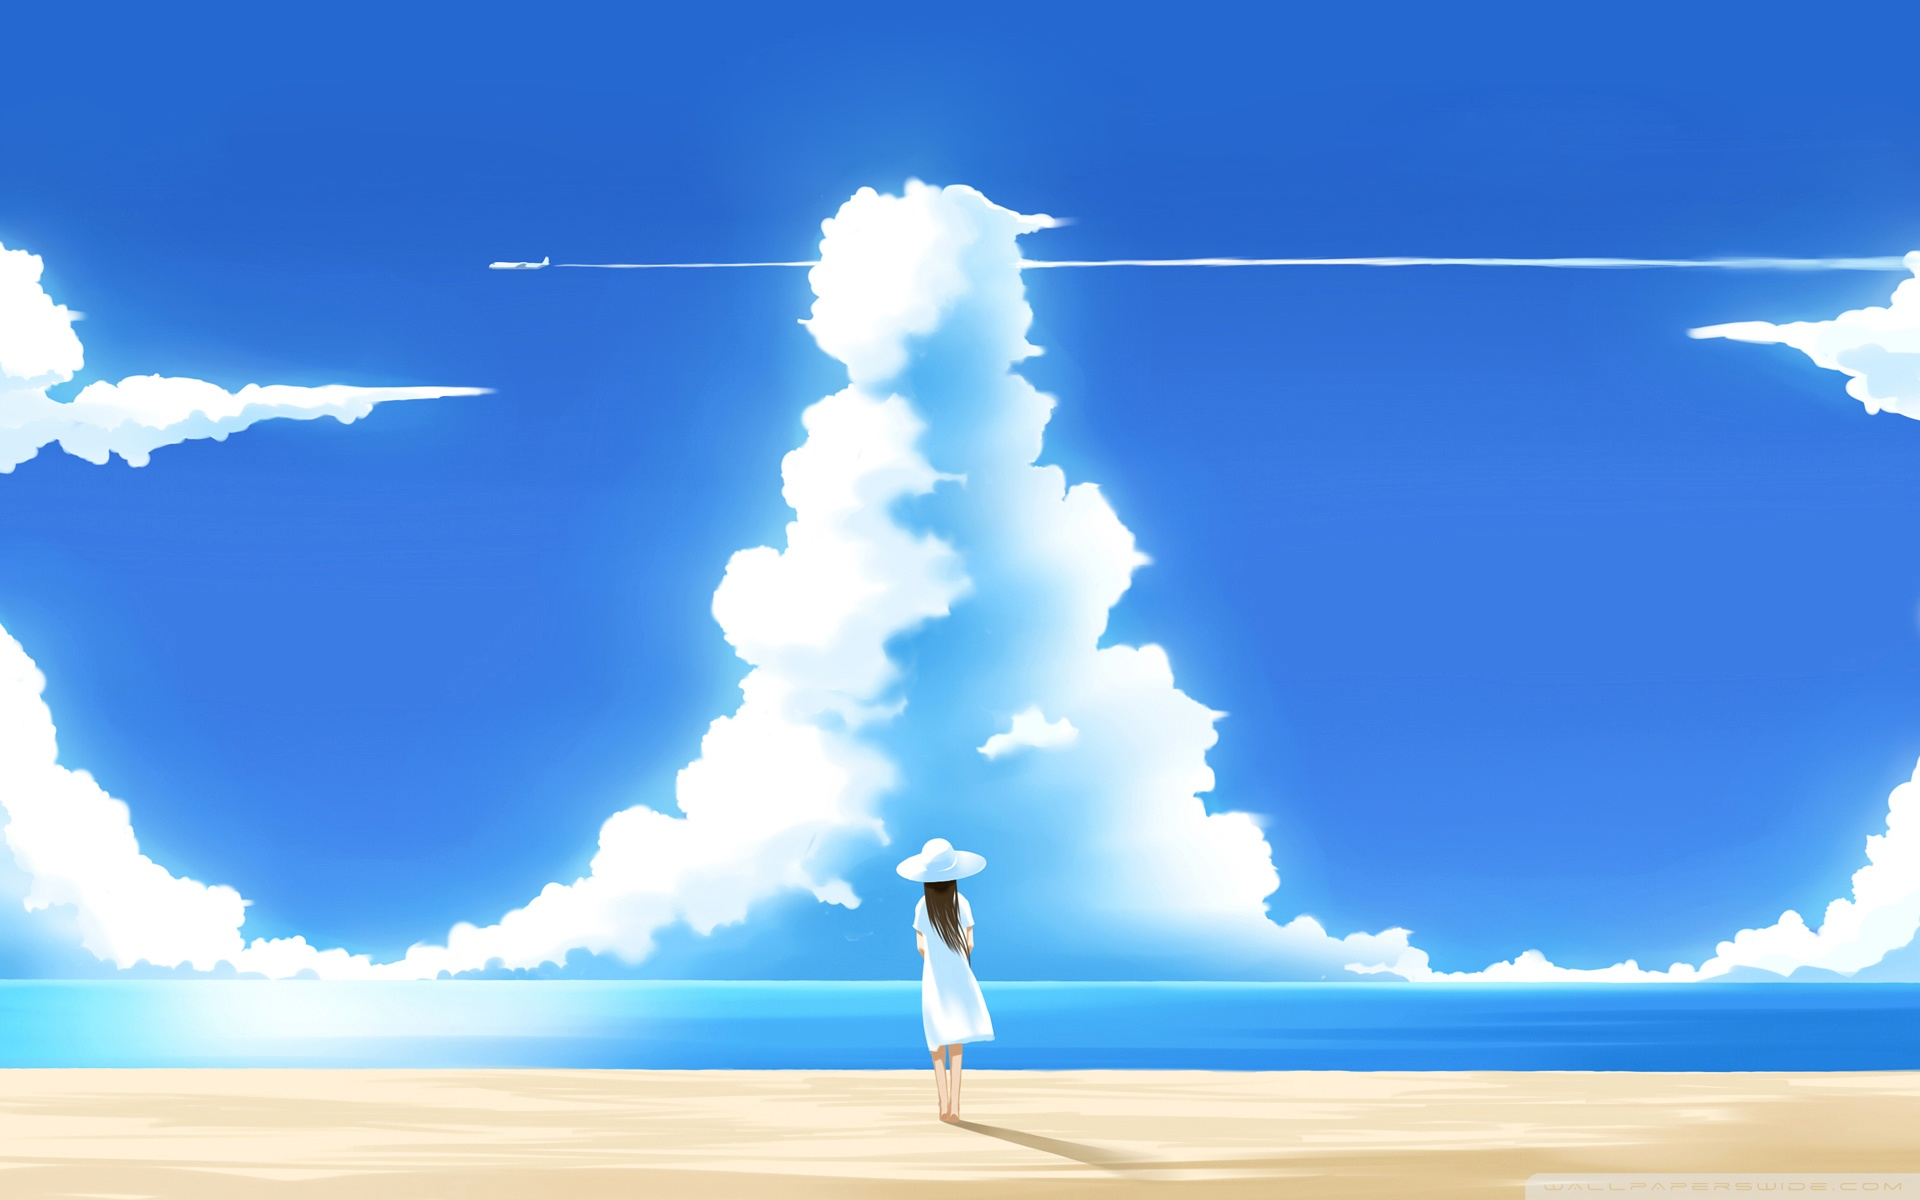 Beautiful Summer Day Illustration 4K HD Desktop Wallpaper for 1920x1200